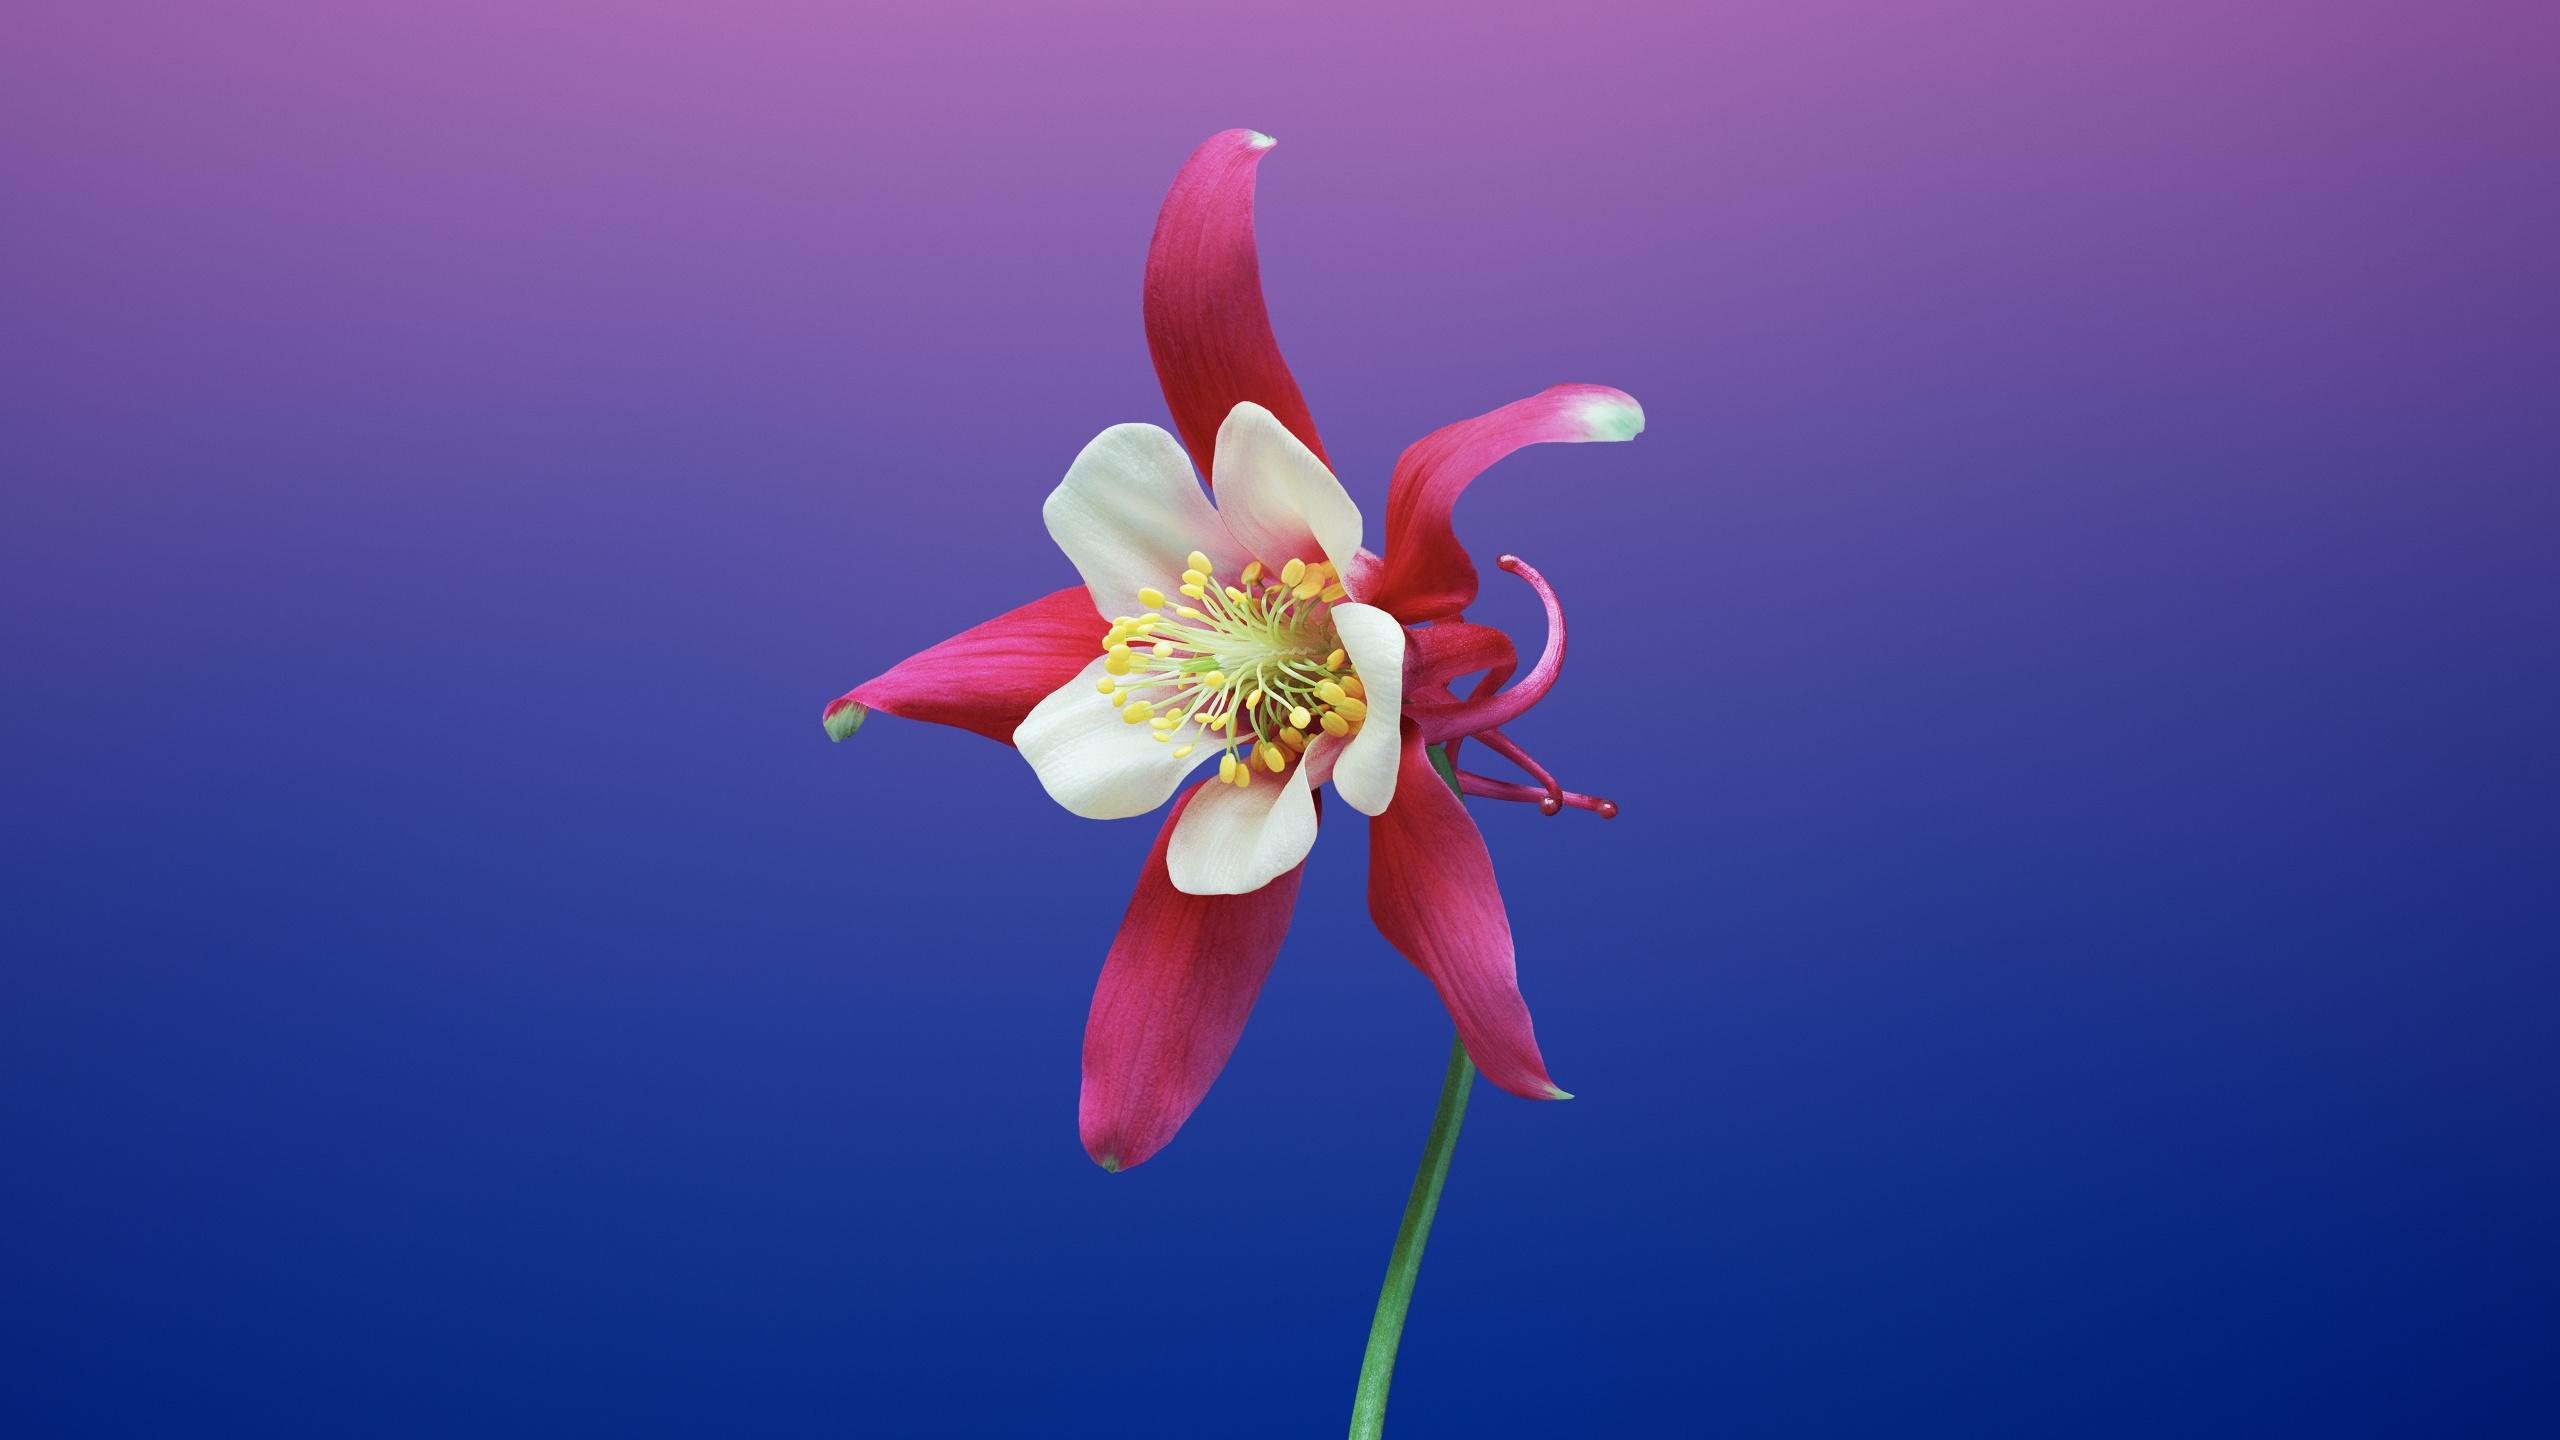 Aquilegia Flower 4k Wallpaper Gradient Background Ios 11 Stock Hd Flowers 774